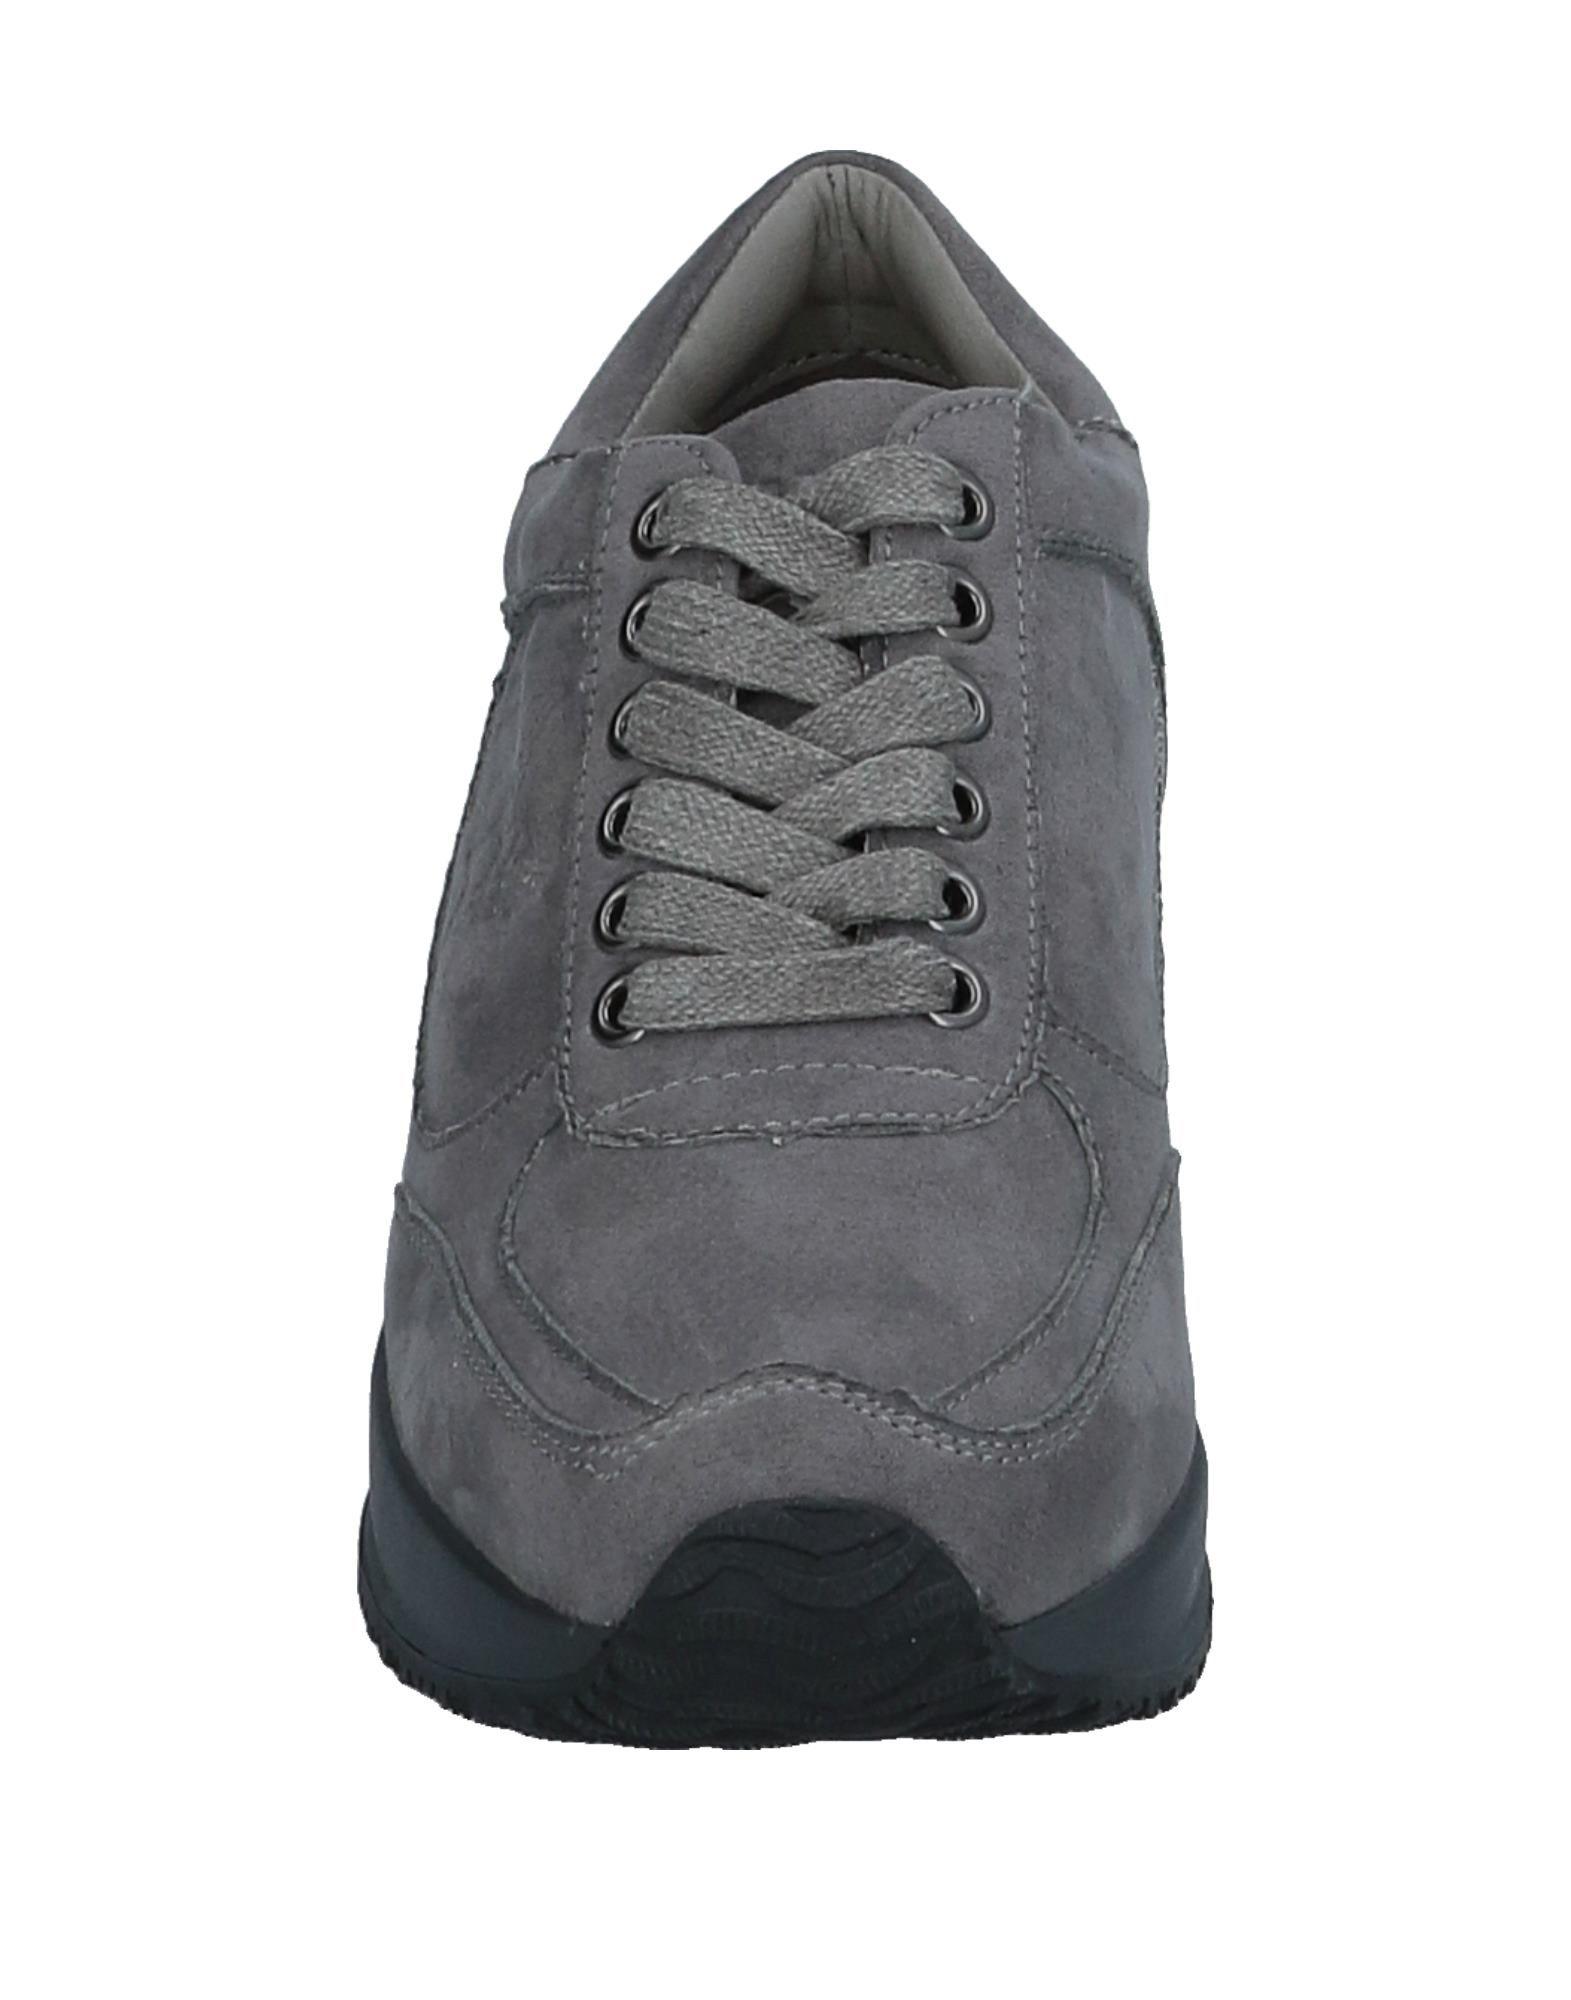 Moda Sneakers Avirex Avirex Avirex Donna - 11522135IQ 62ad3c